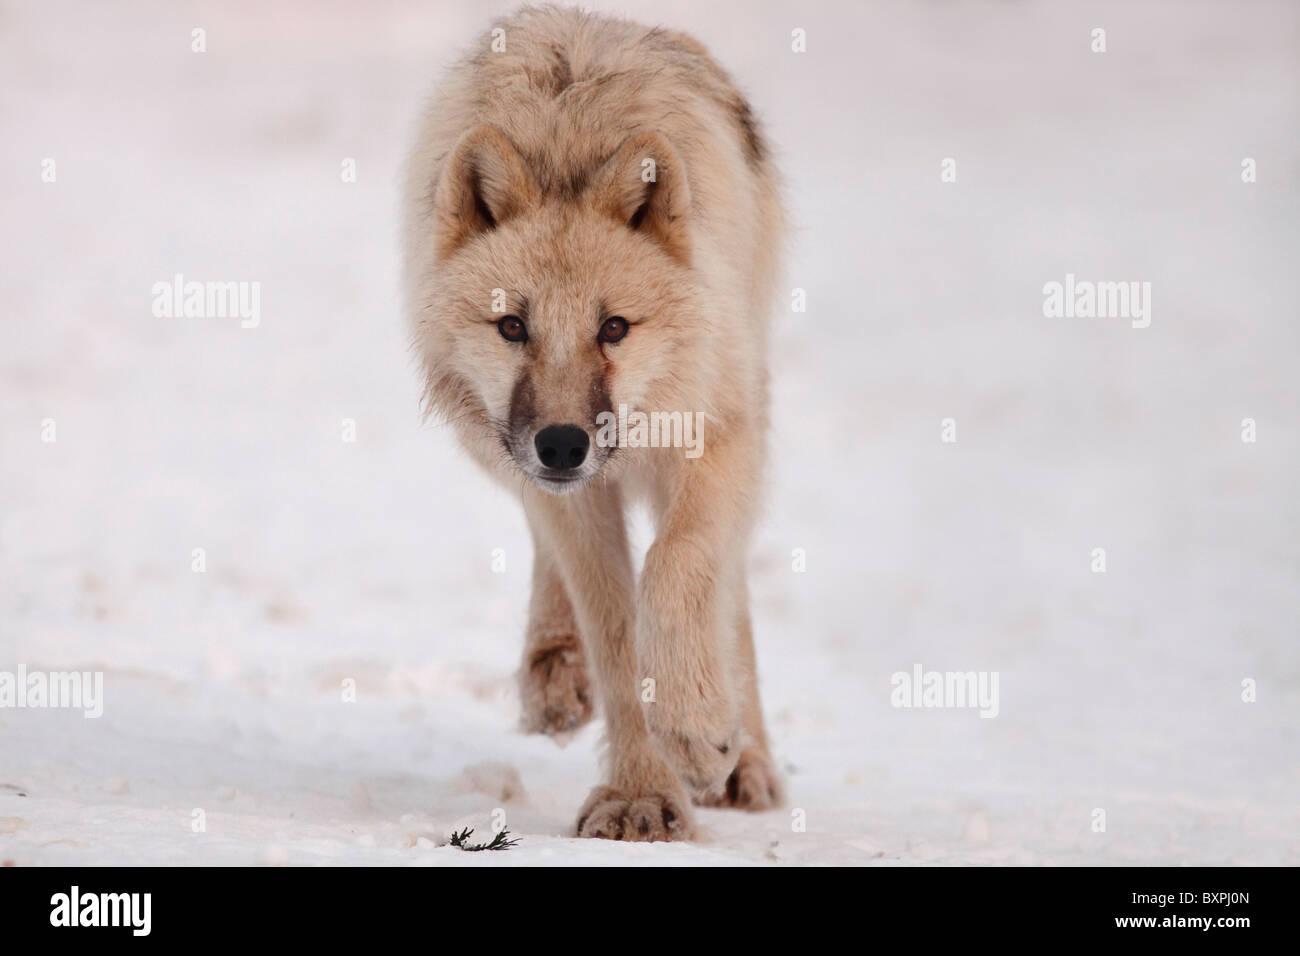 Arctic Wolf whelp, Latin: Canis lupus arctos; Polar Wolf , White Wolf - Stock Image